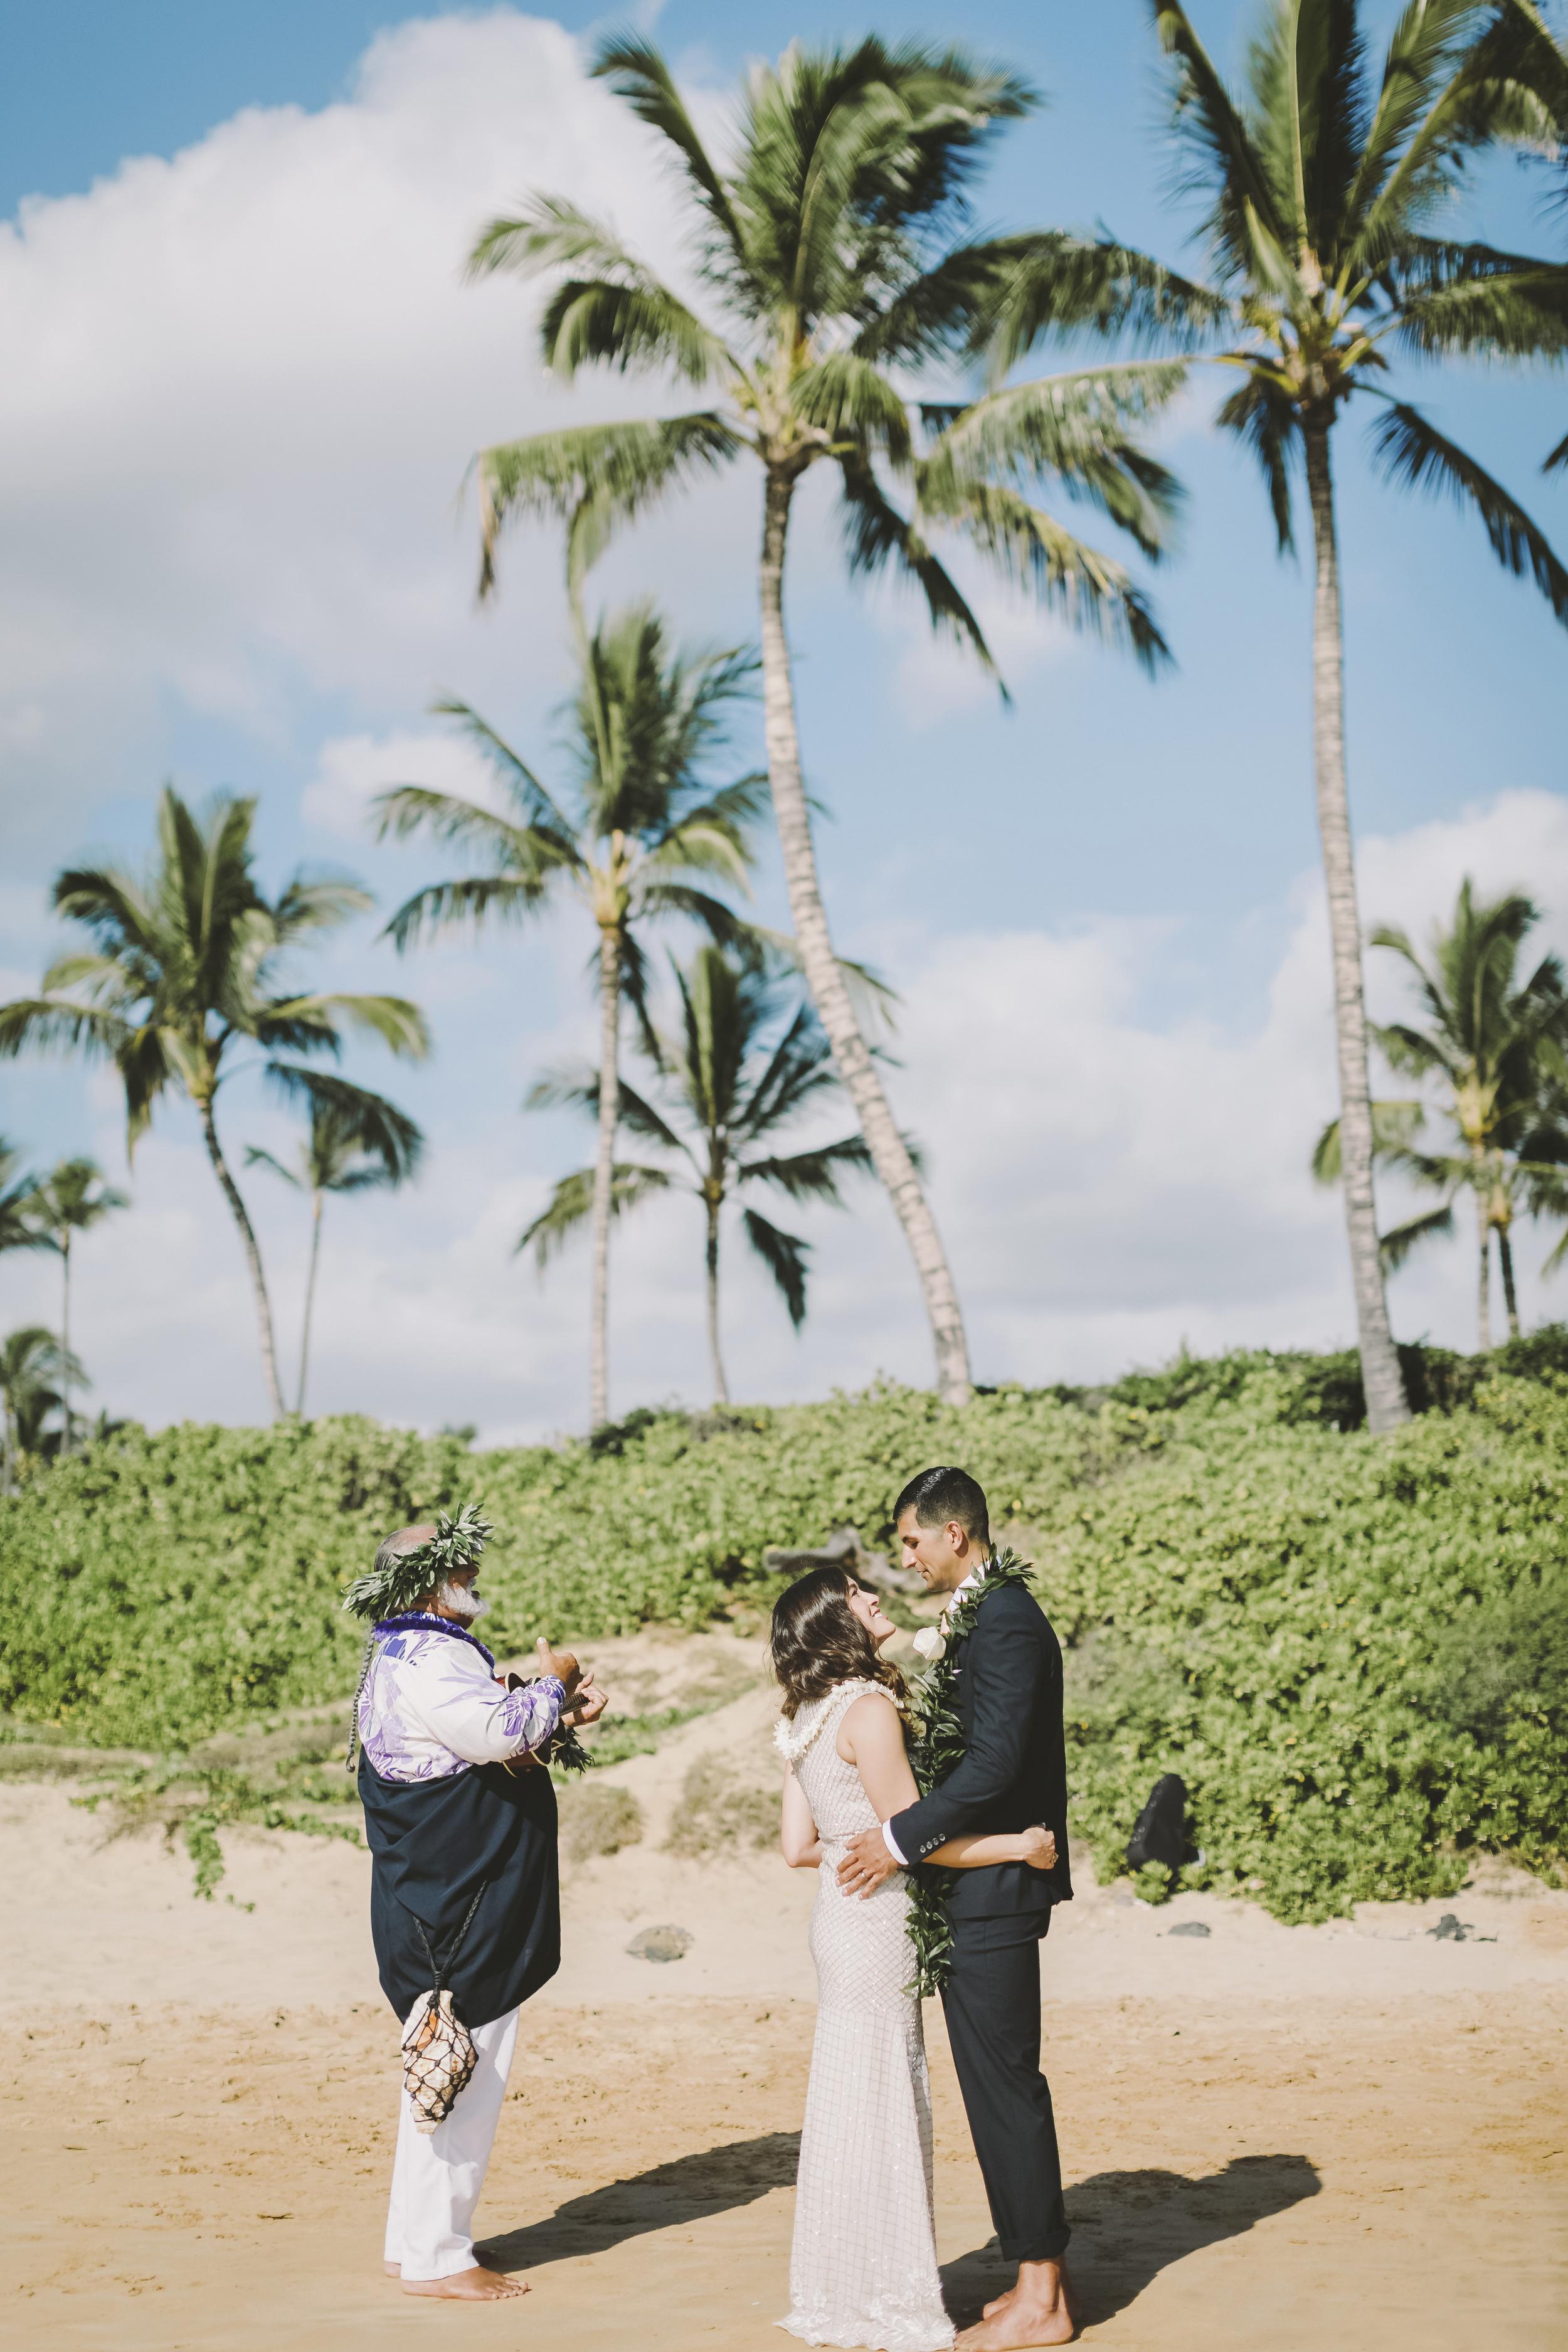 angie-diaz-photography-mokapu-beach-maui-elopement-31.jpg